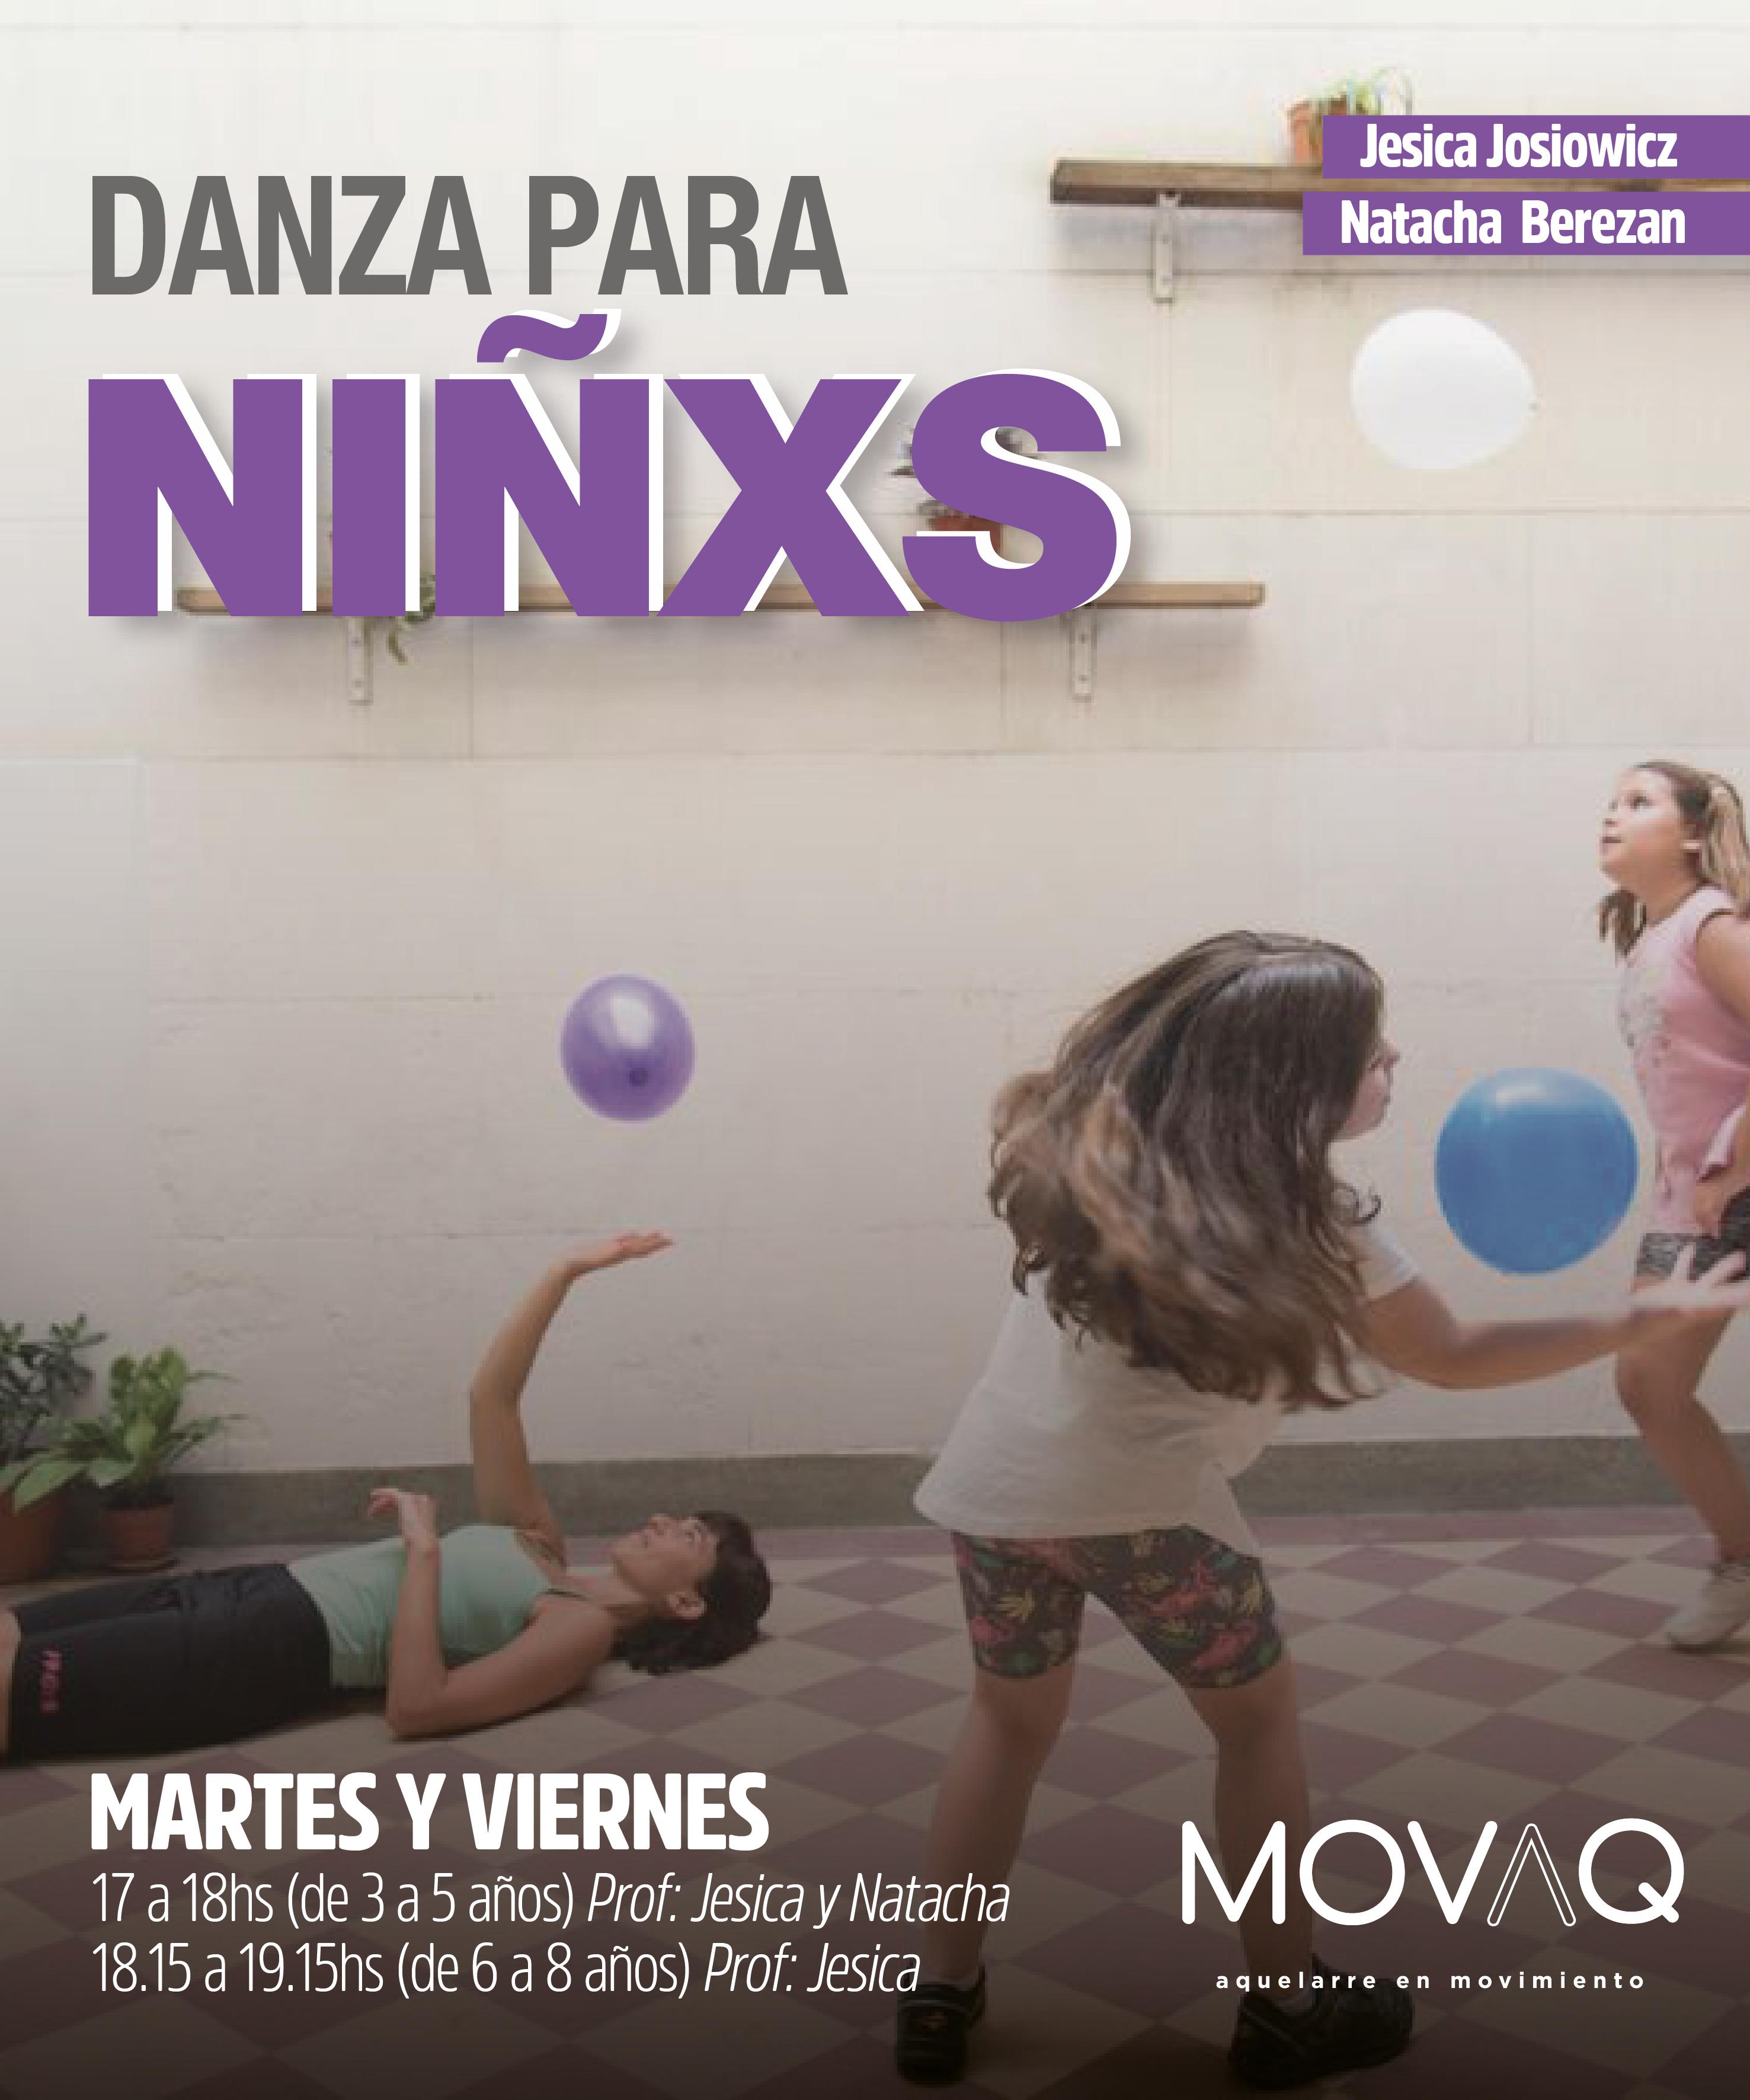 Danza para ninxs